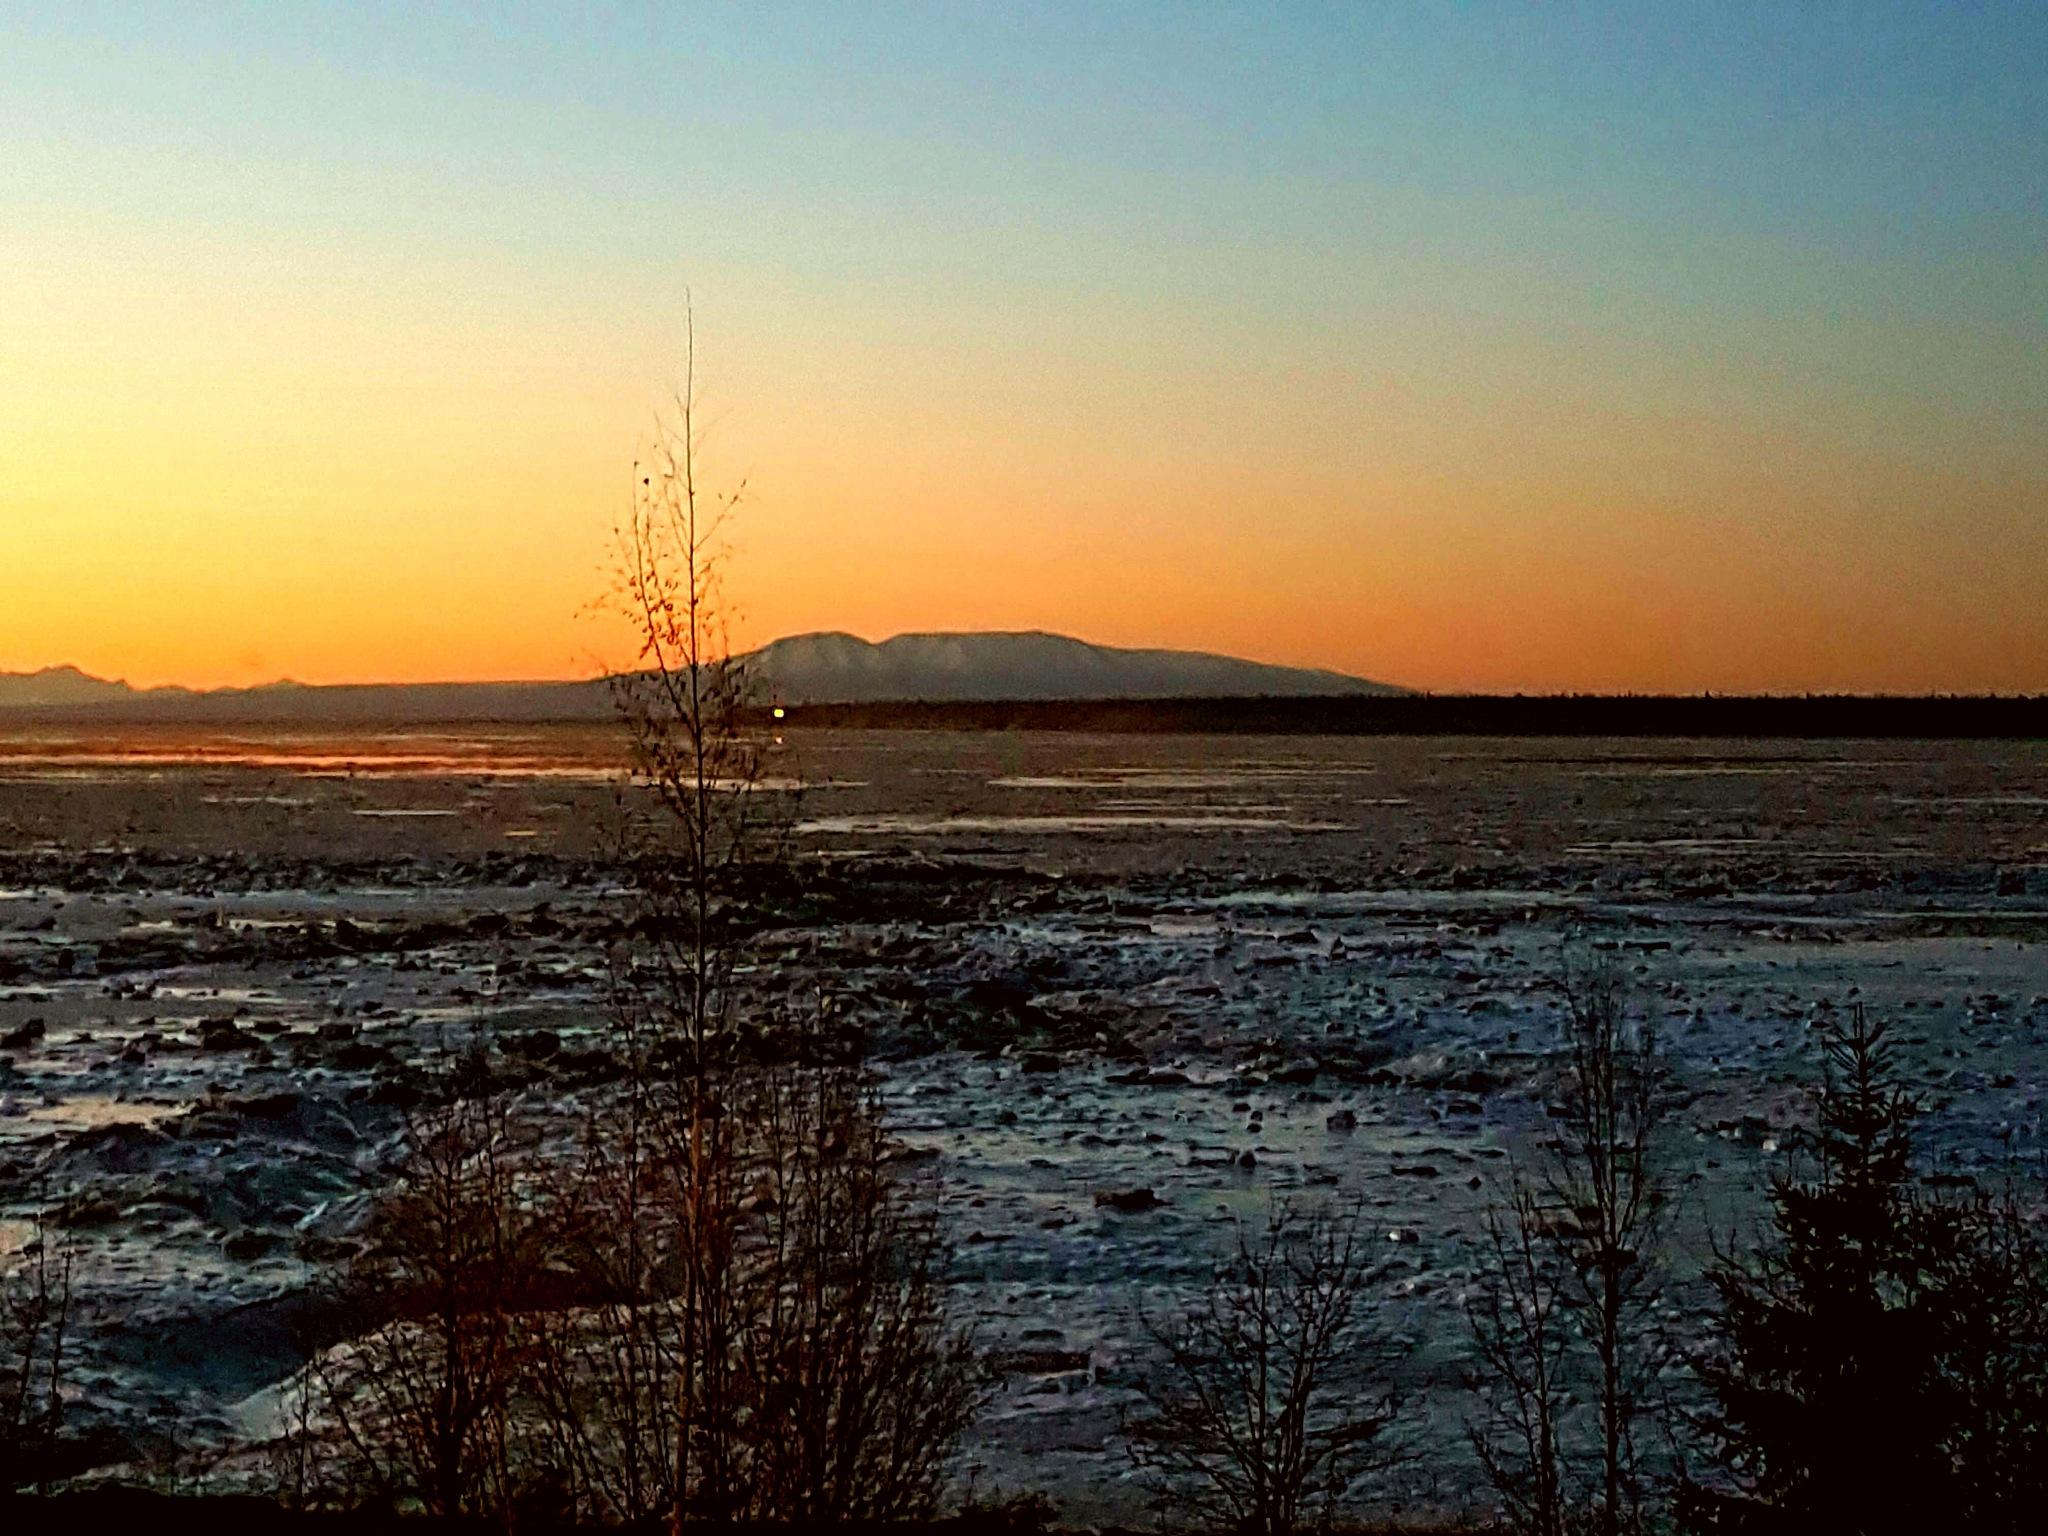 Sleeping Lady Sunset by teresa.thiele1